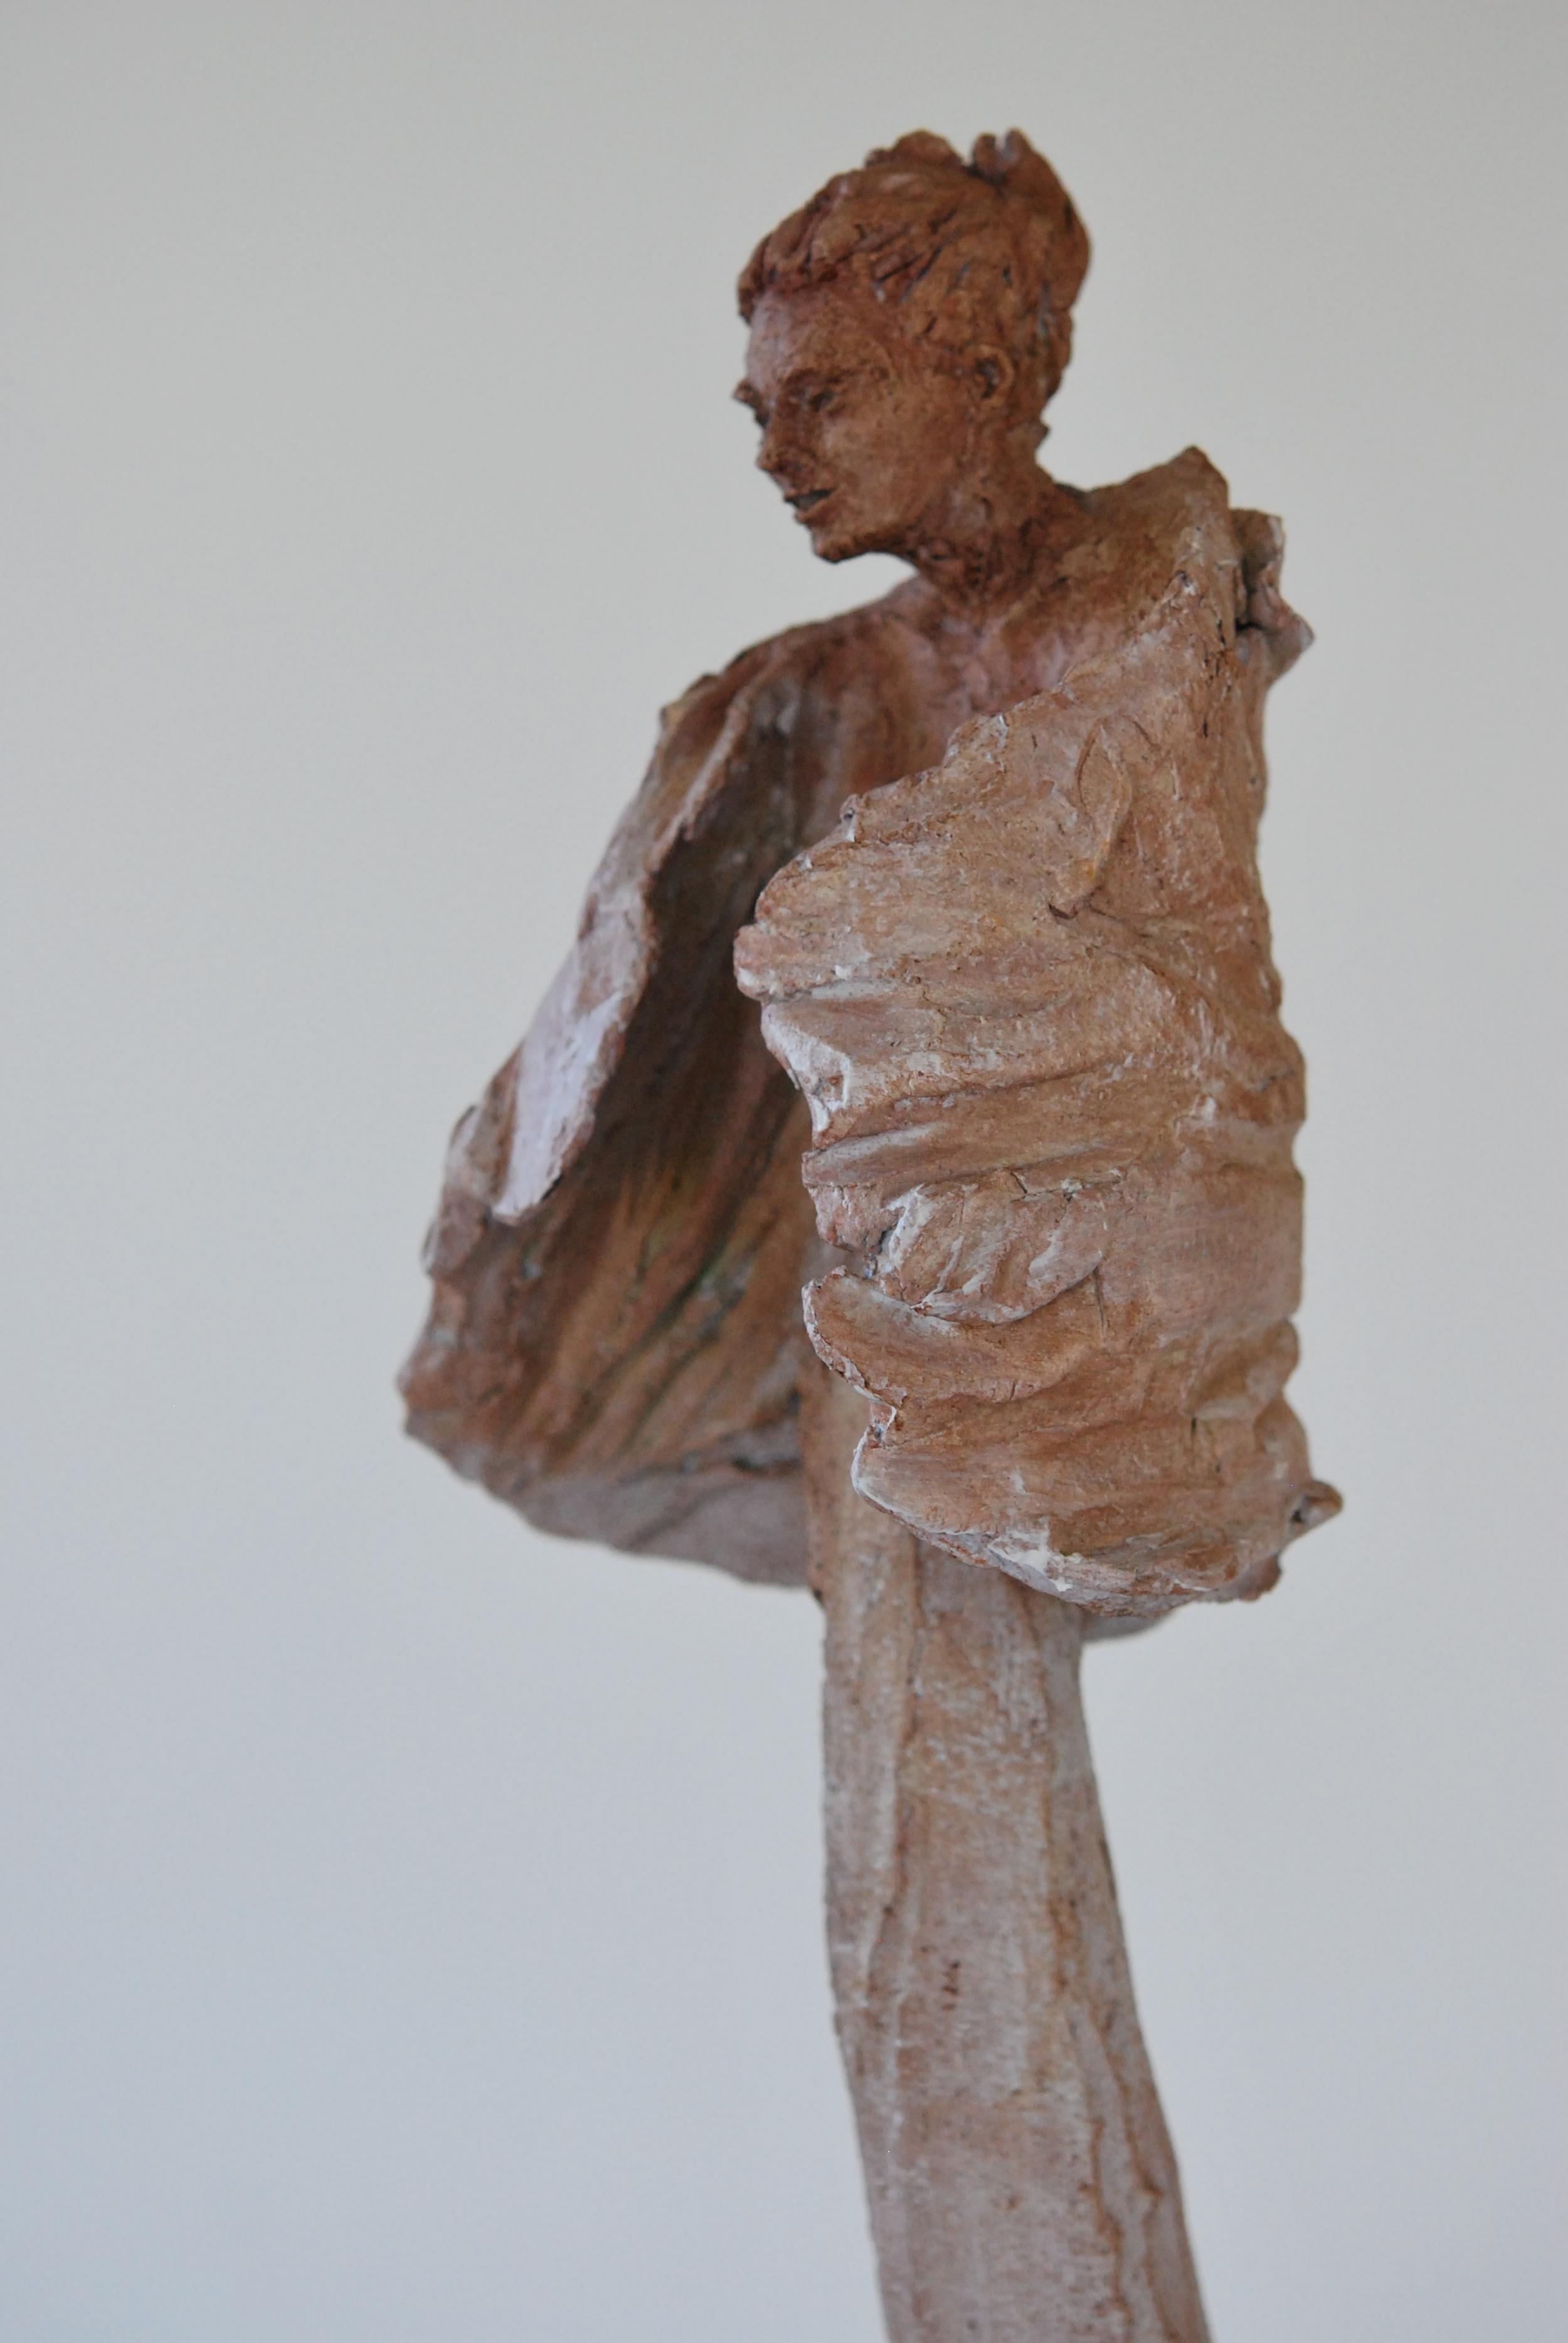 Chrysalide, 50cm, 2009